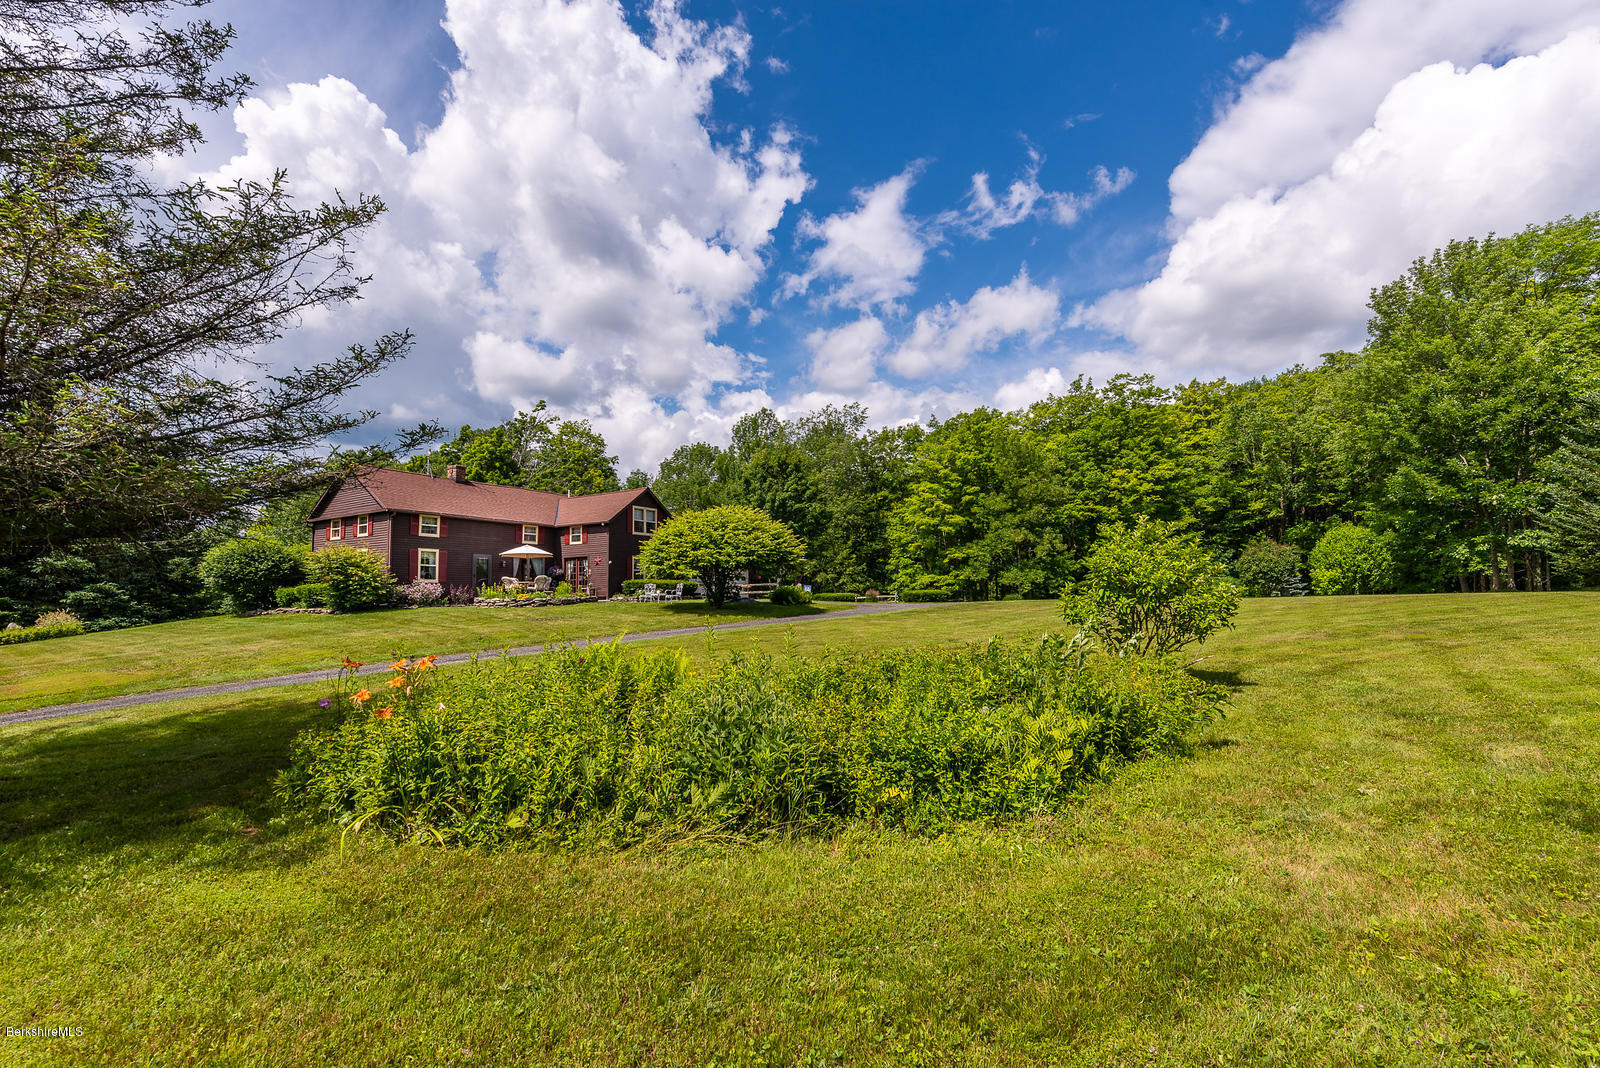 103 Goose Pond, Tyringham, Massachusetts 01264, 4 Bedrooms Bedrooms, 7 Rooms Rooms,2 BathroomsBathrooms,Residential,For Sale,Goose Pond,235230